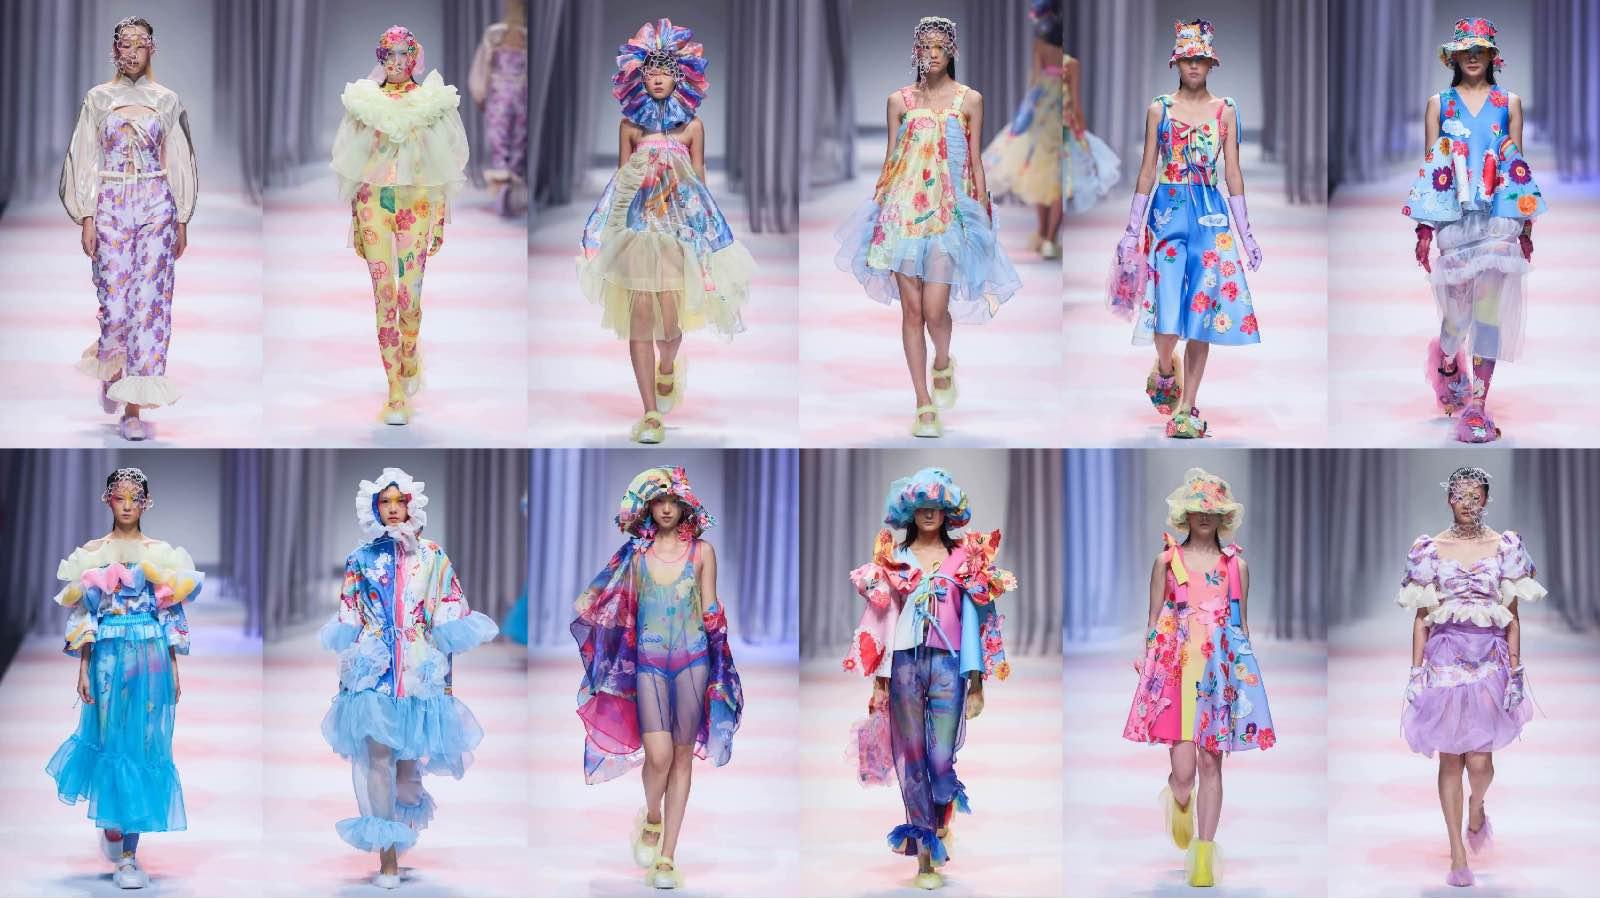 SS2021上海时装周Colorwonderland闪亮发布